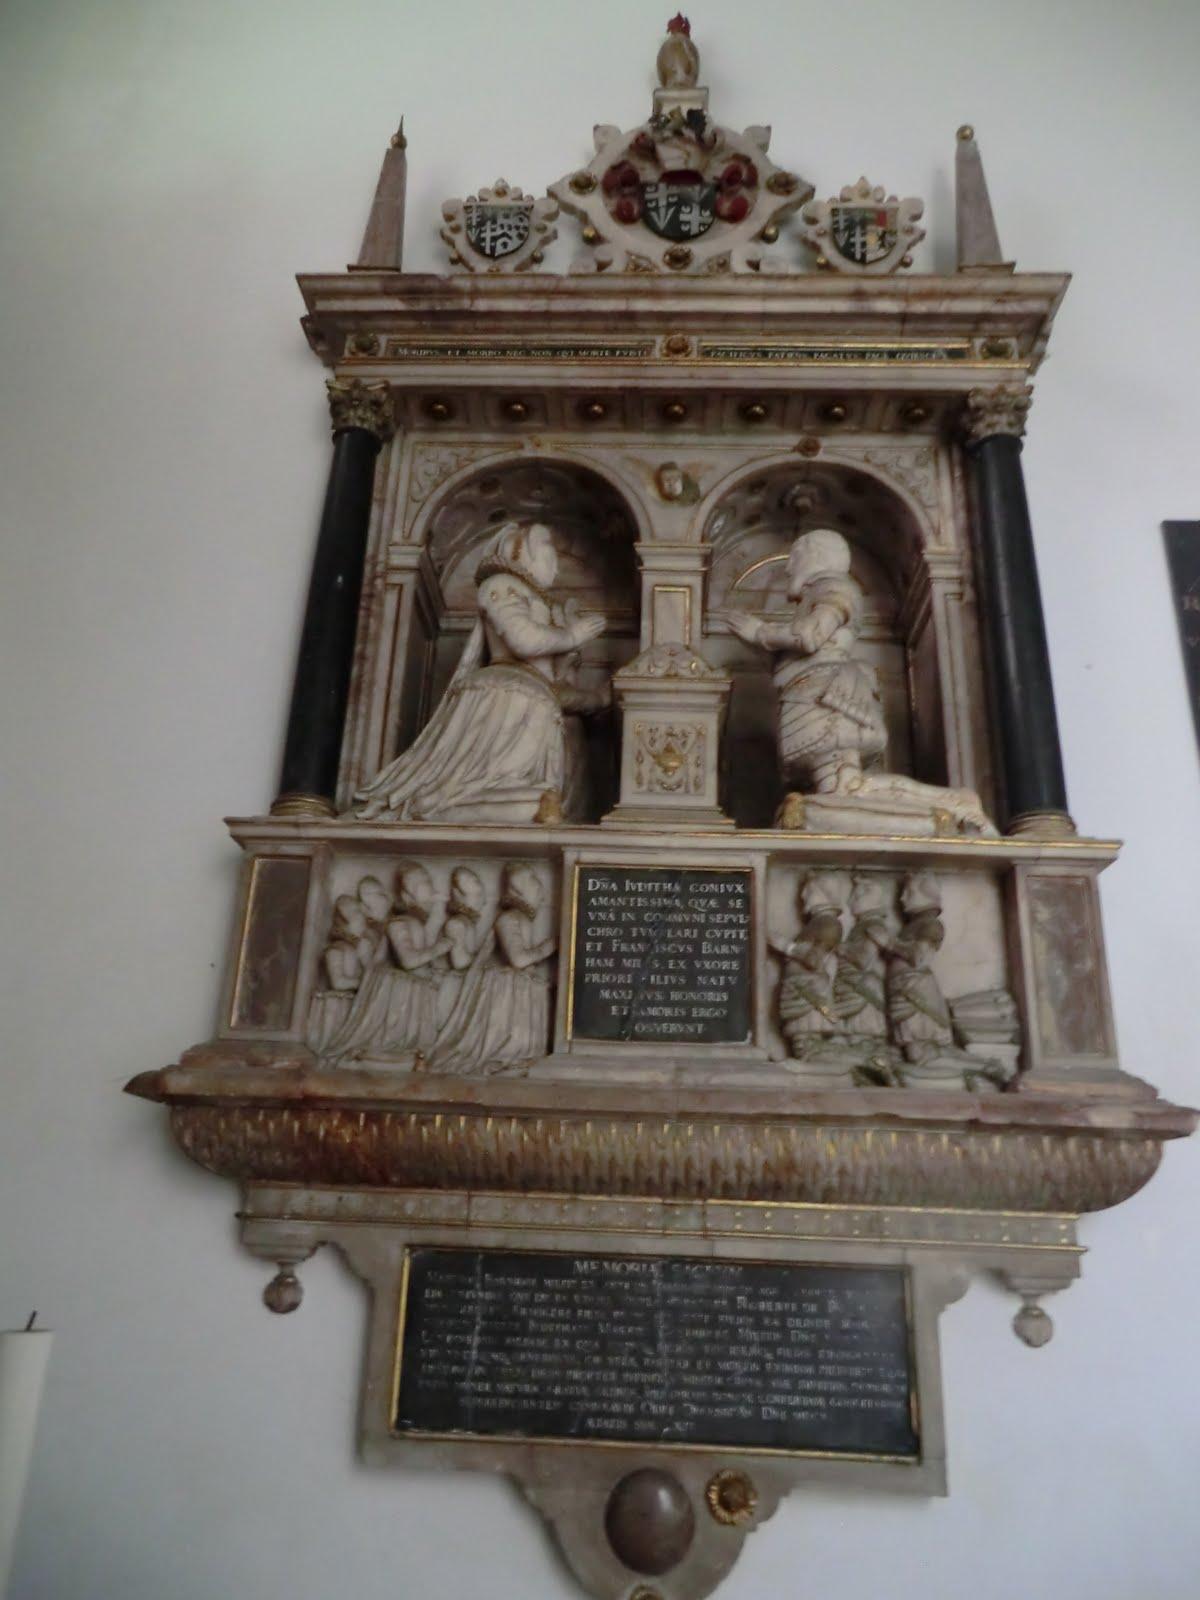 CIMG2578 Barnham monument, All Saints church